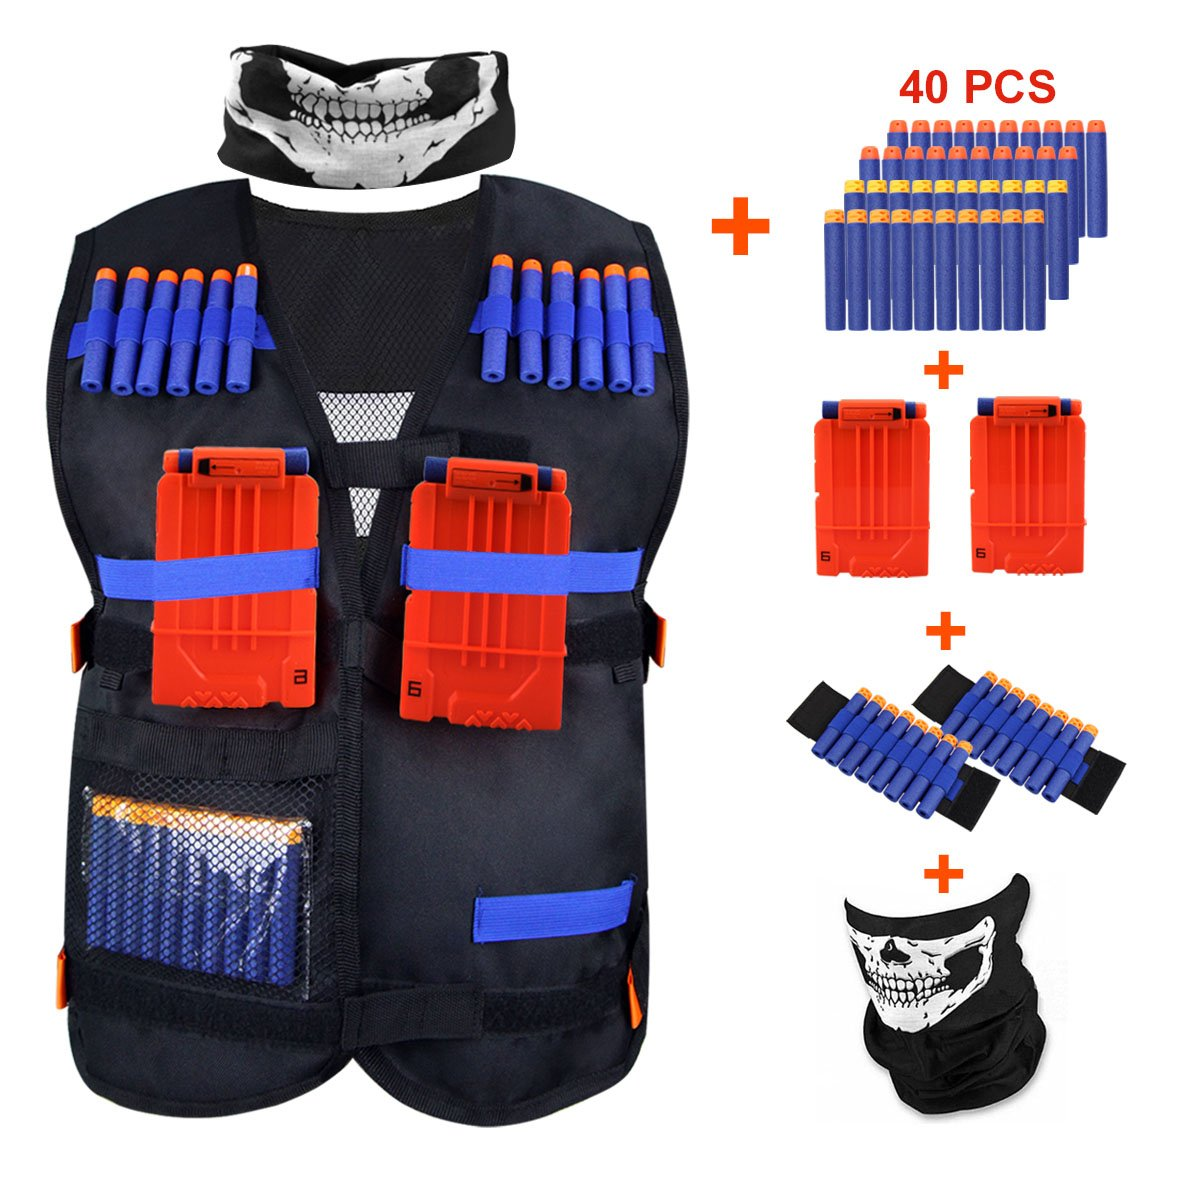 KINBON Kids Tactical Vest Kit, Adjustable Boys Nerf Vest for Nerf N-strike Elite Series Kids with 40 Pcs Foam Darts + 2Pcs 6-dart Quick Reload Clip + 1Pcs Skull Mask + 2Pcs 8-dart Wrist Band